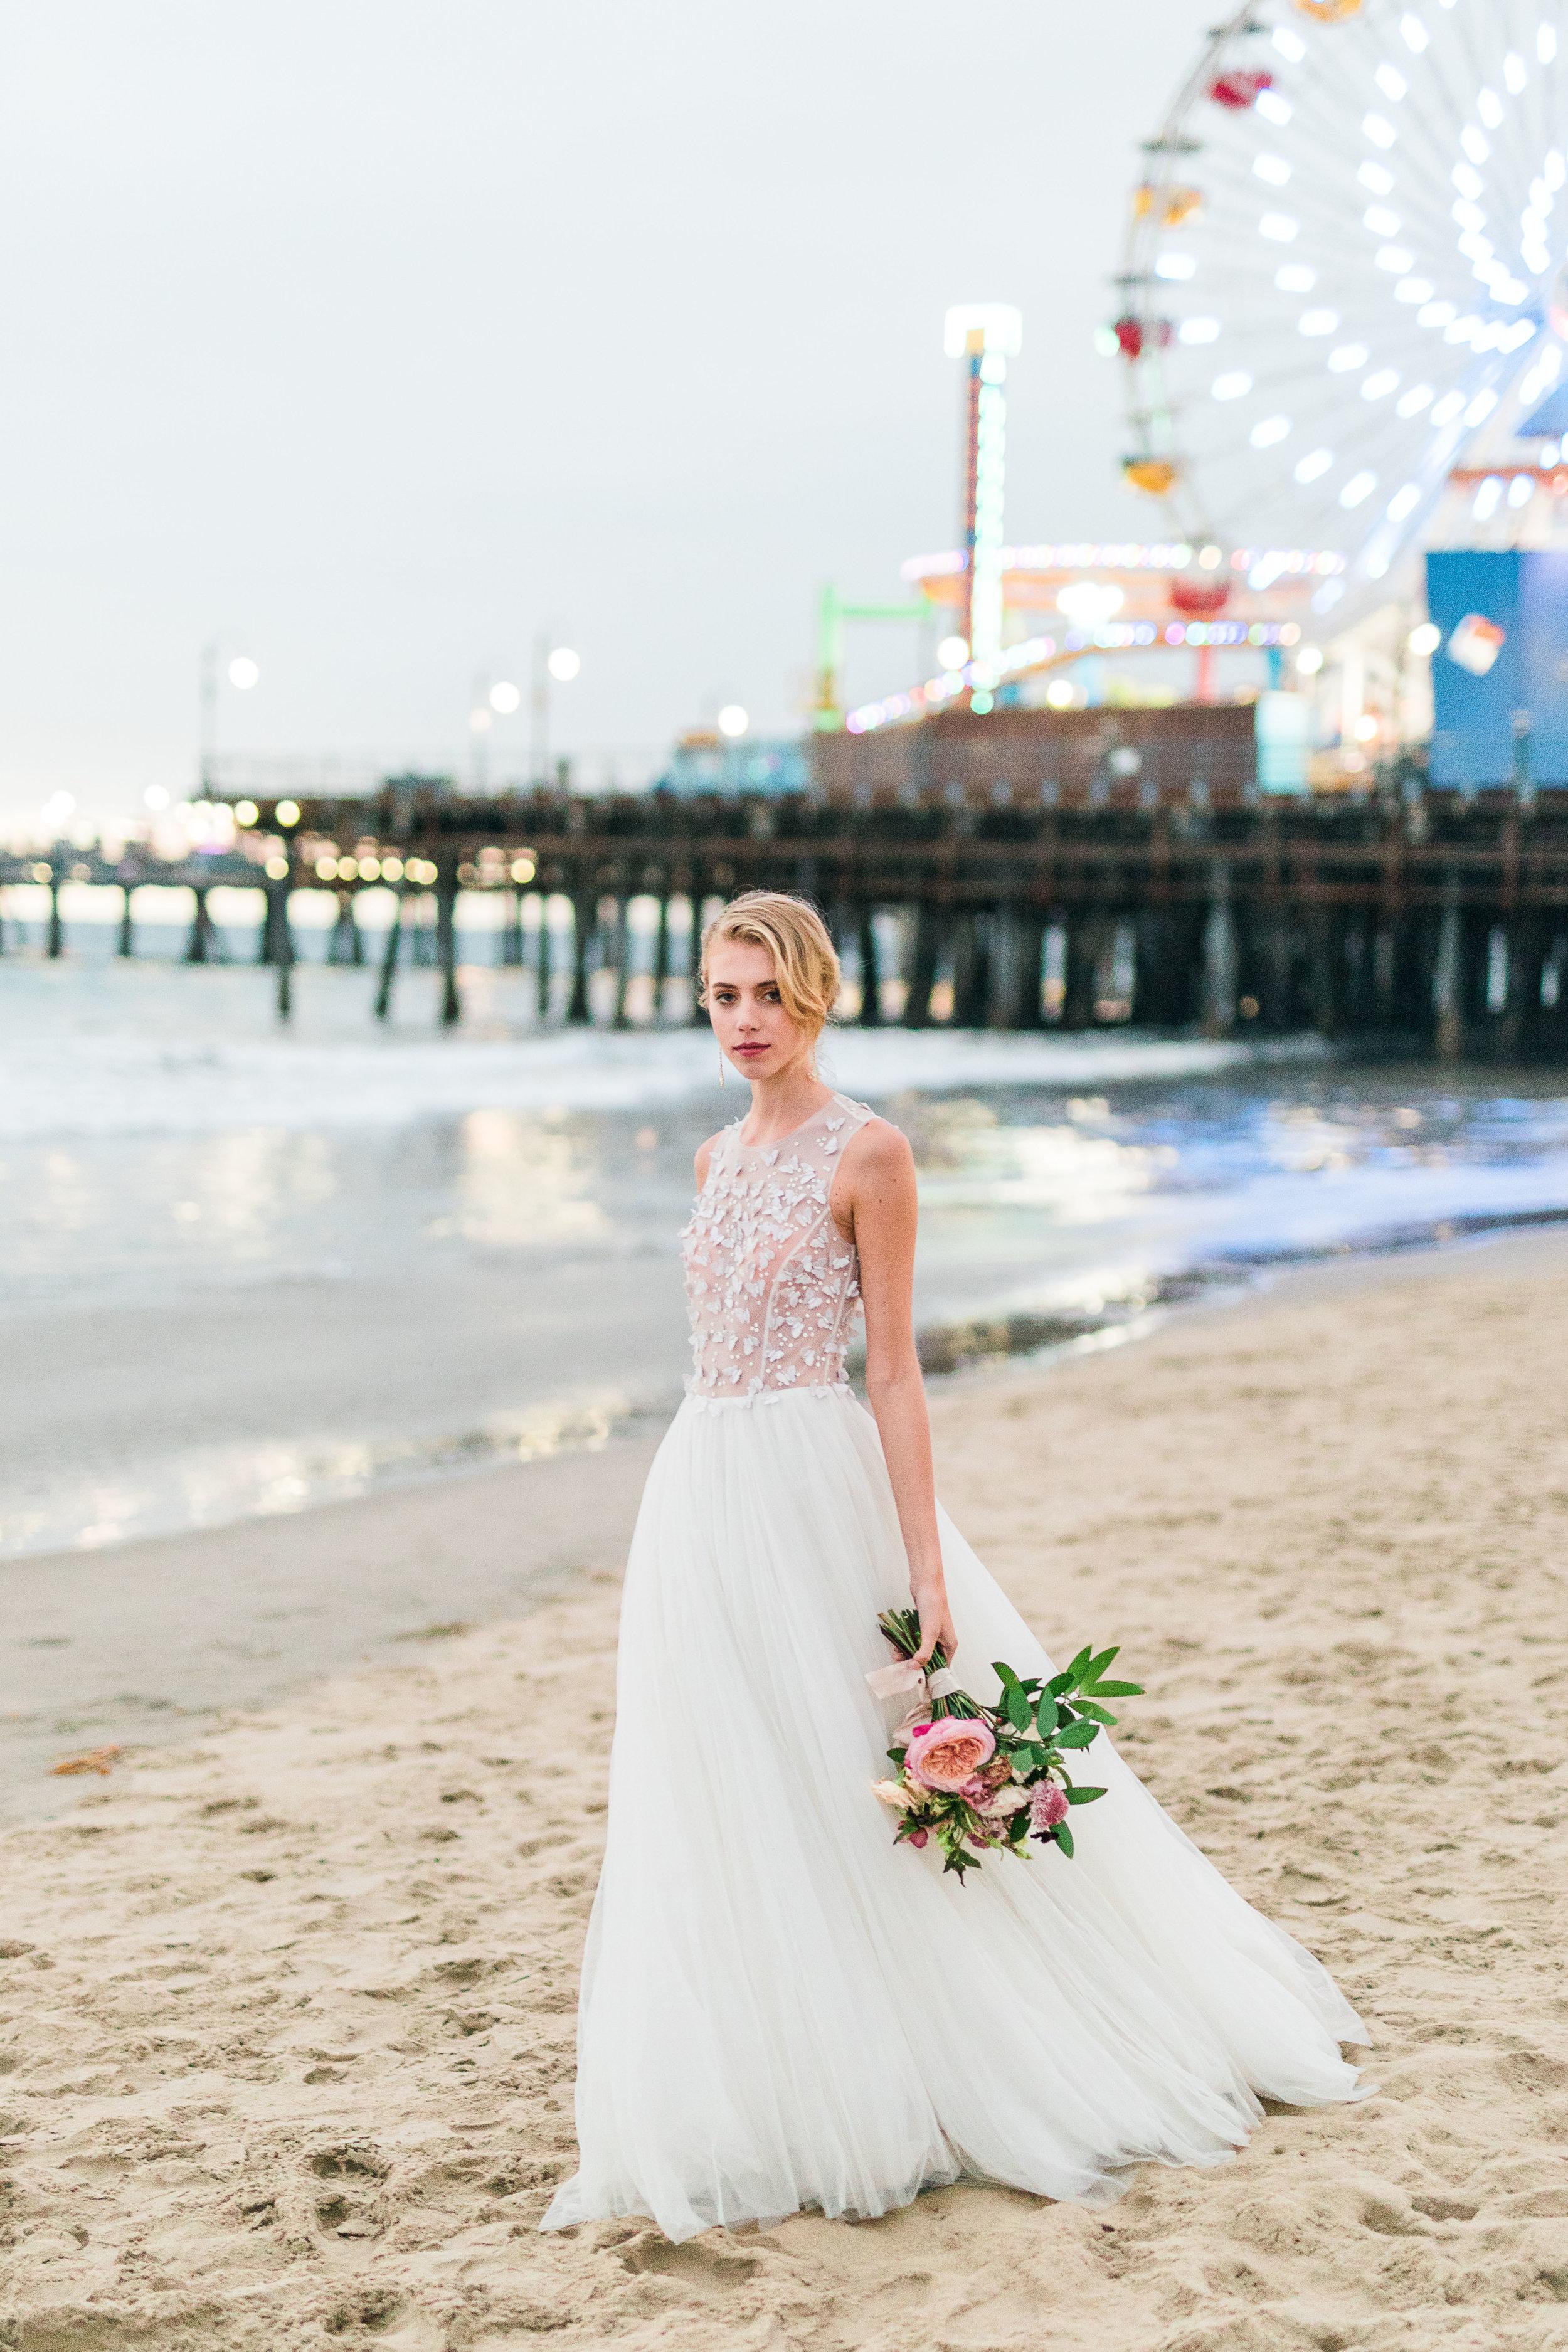 LA-Wedding-Shoot-by-JBJ-Pictures-195.jpg